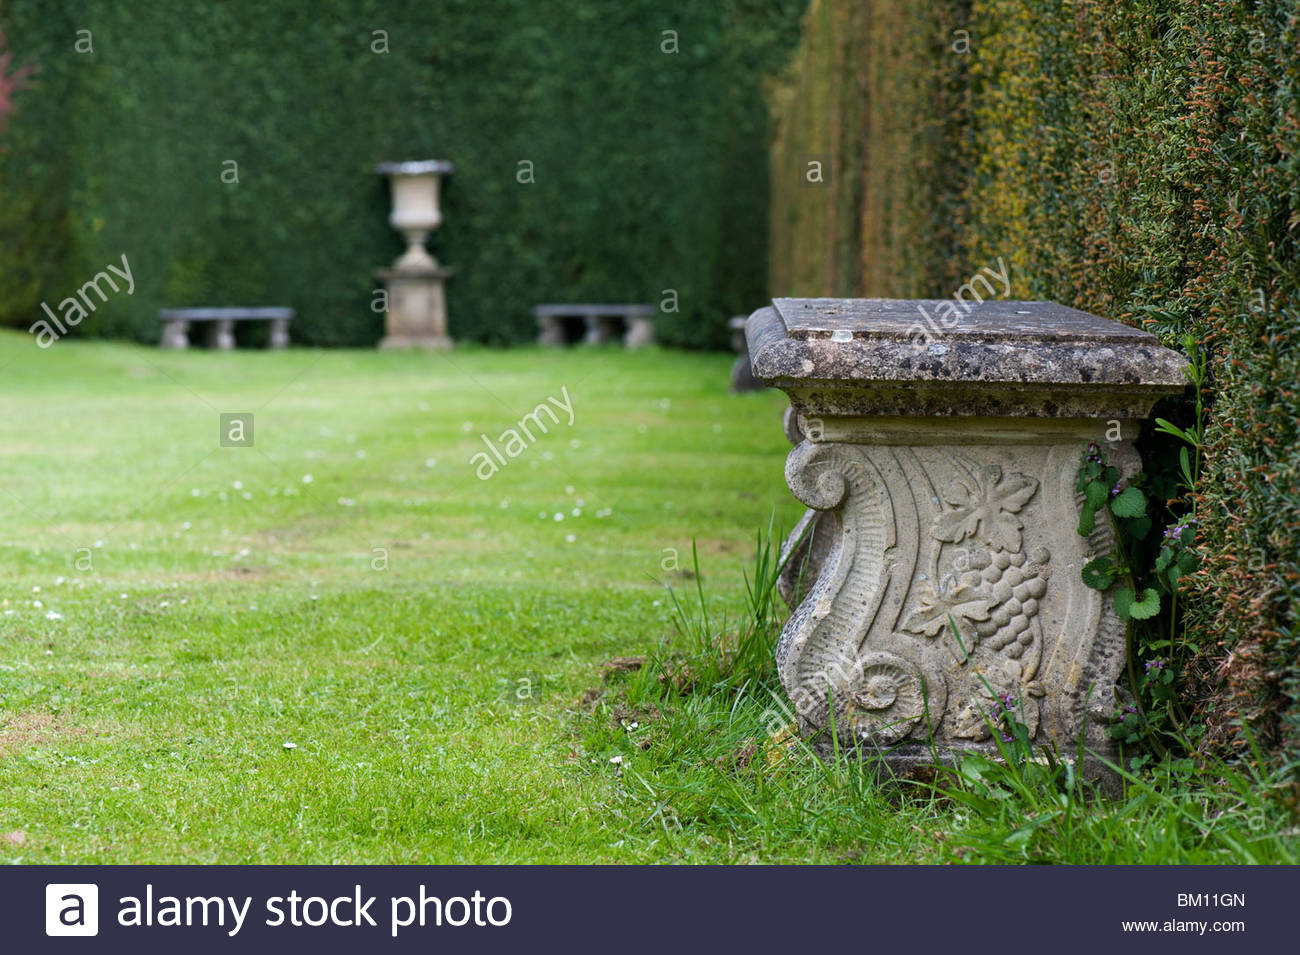 Il Sedile In Pietra In Un Giardino Formale Waterperry Giardini